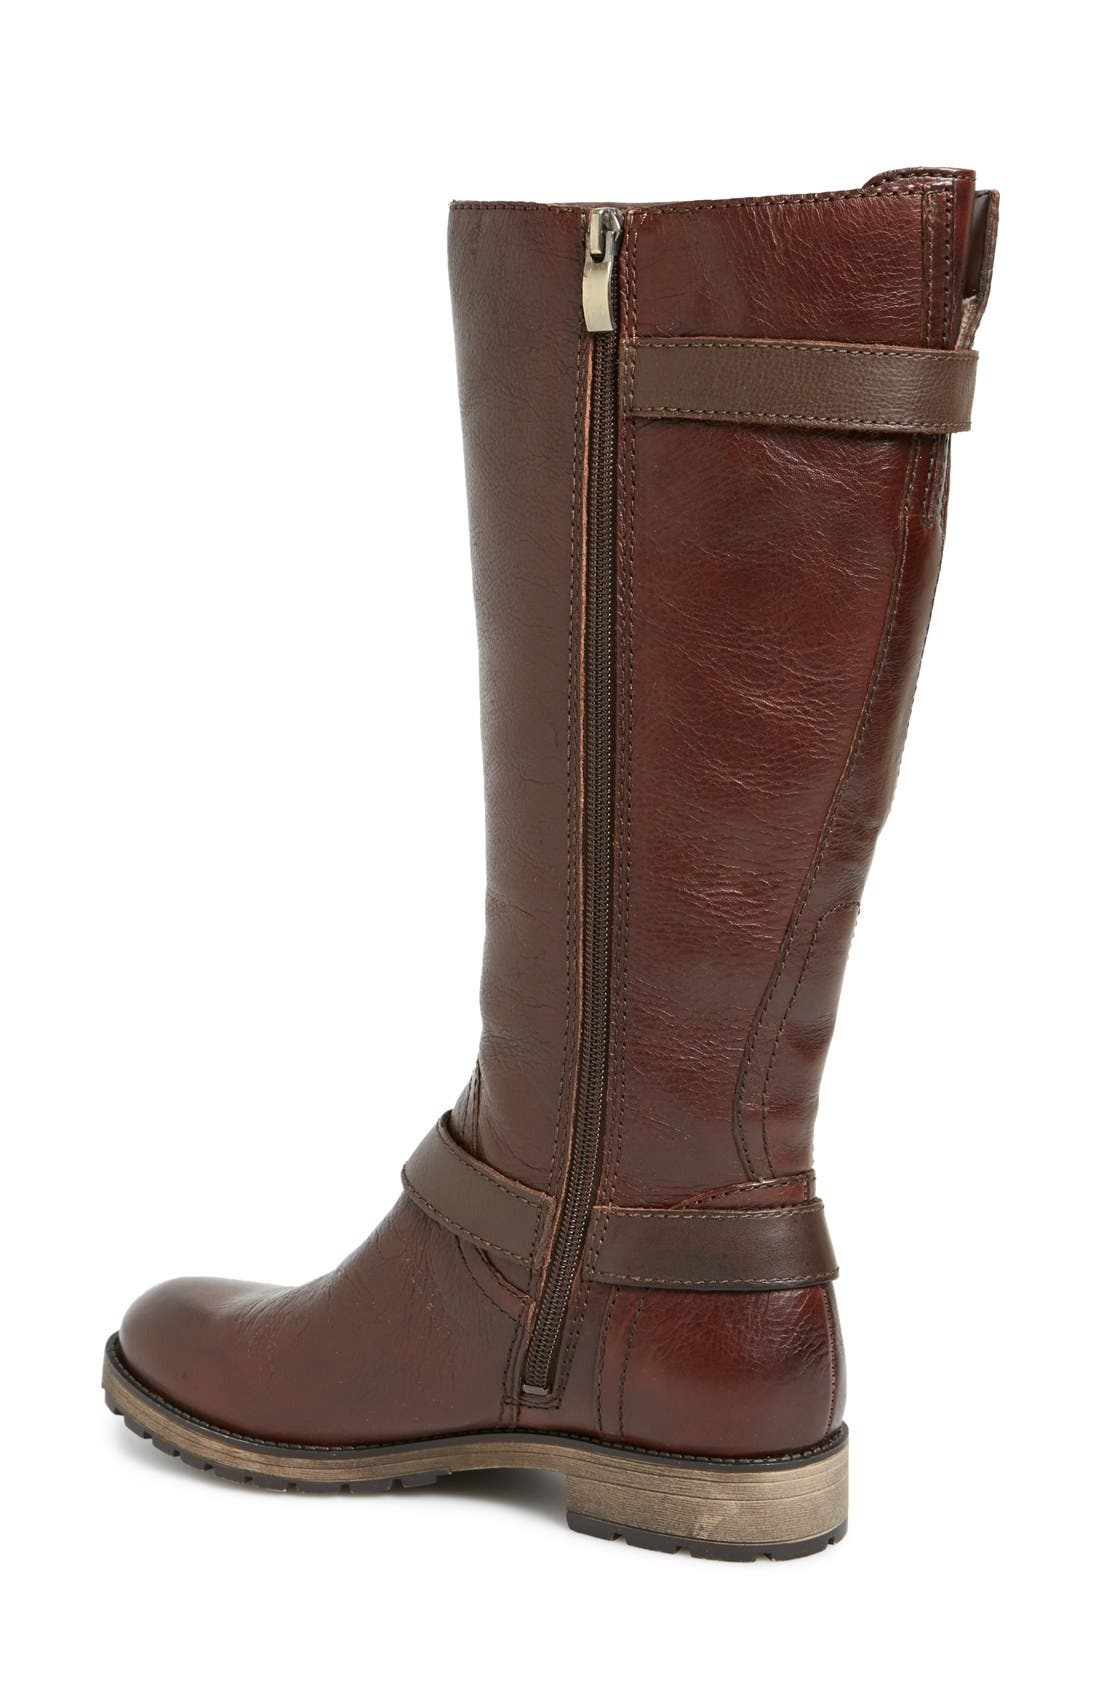 'Tanita' Boot,                             Alternate thumbnail 2, color,                             Tan Leather